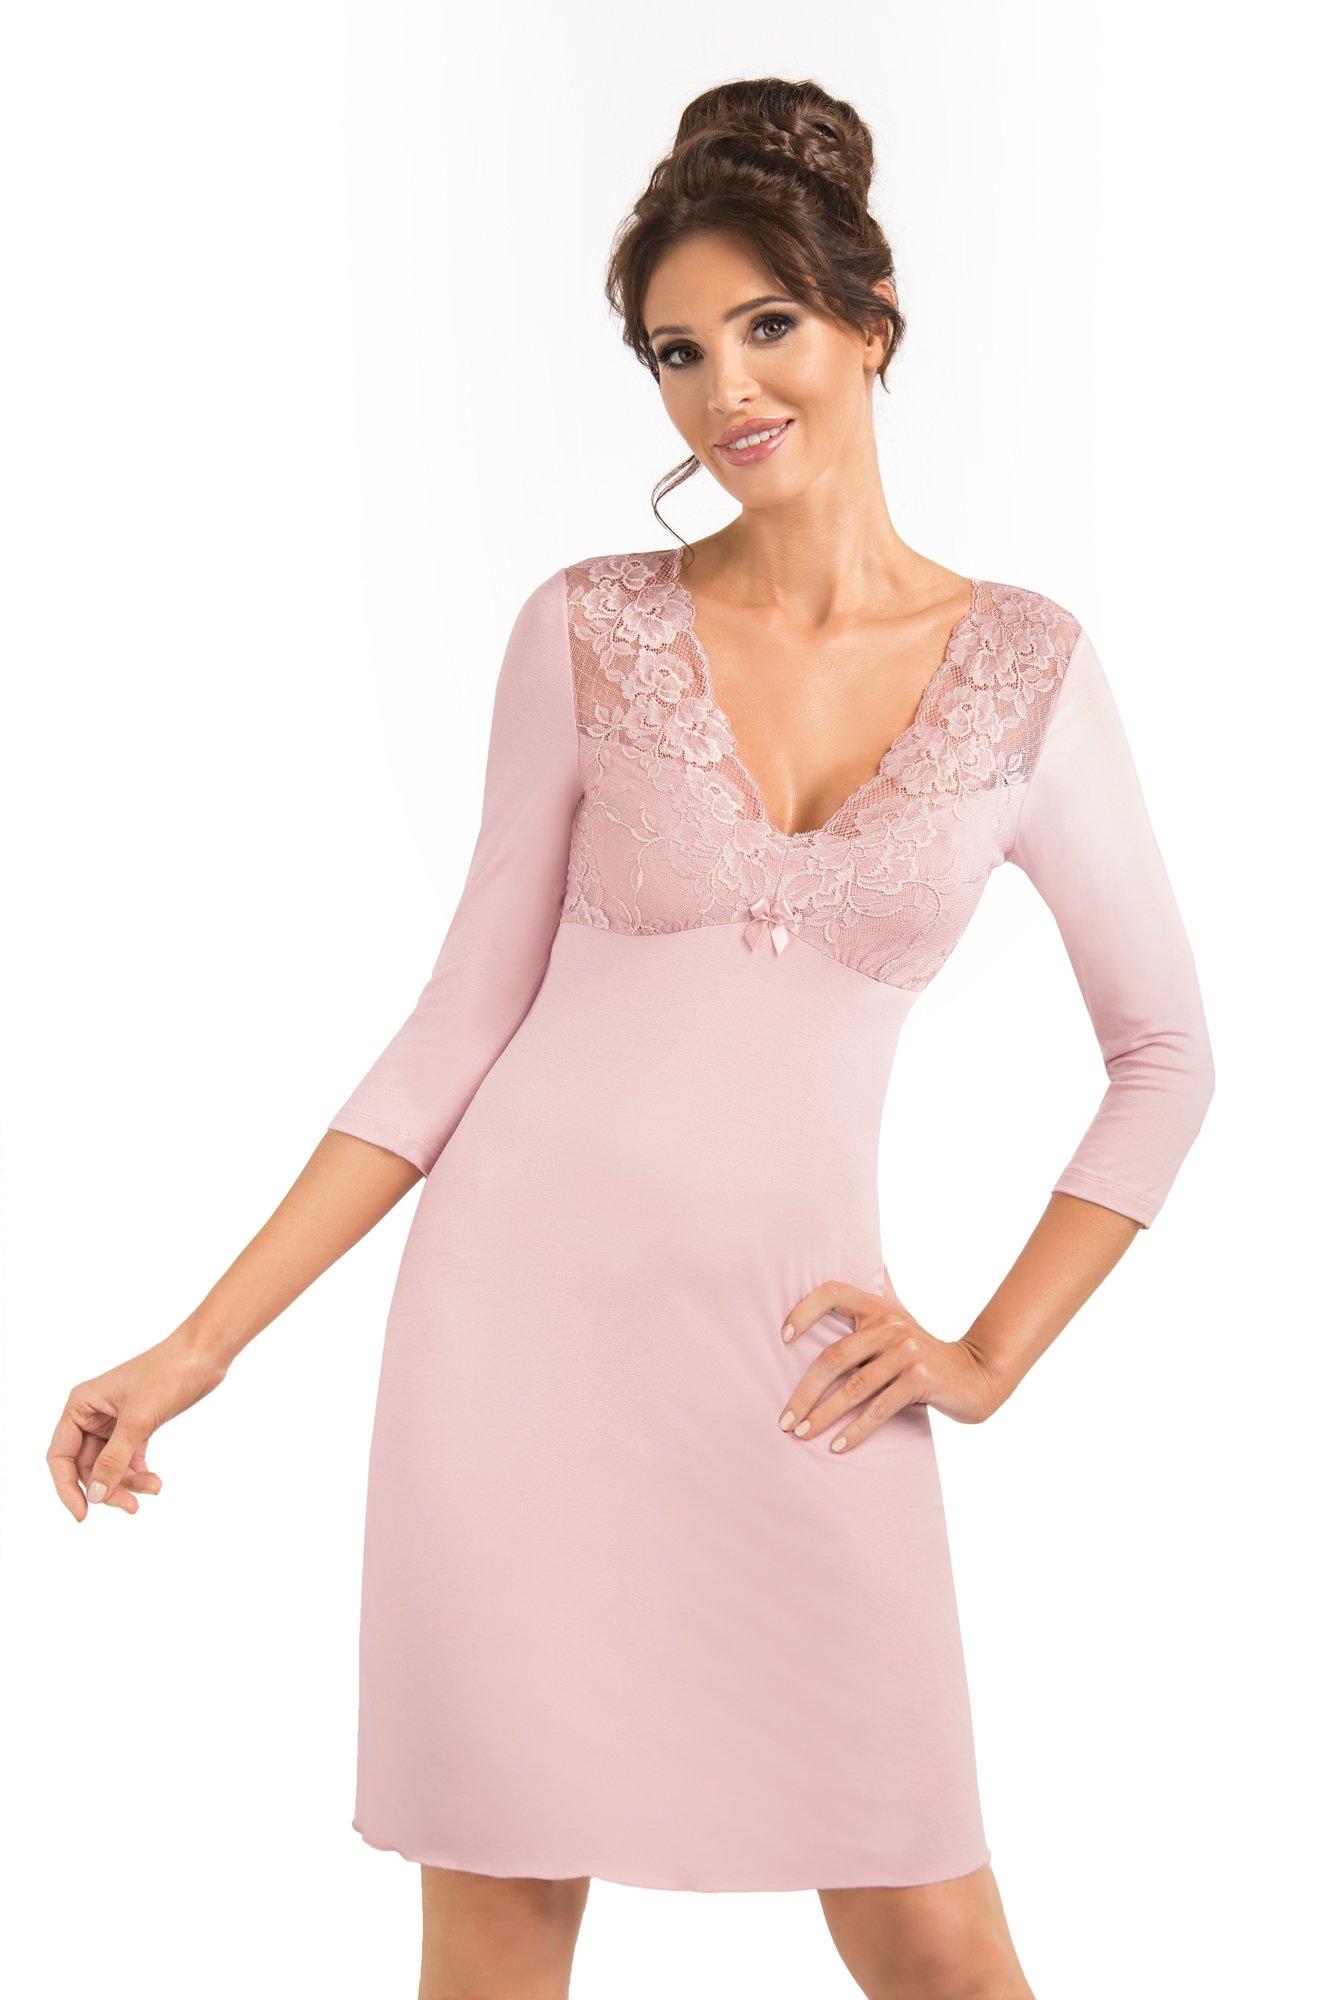 Simone II Powder Pink-LIGPIN